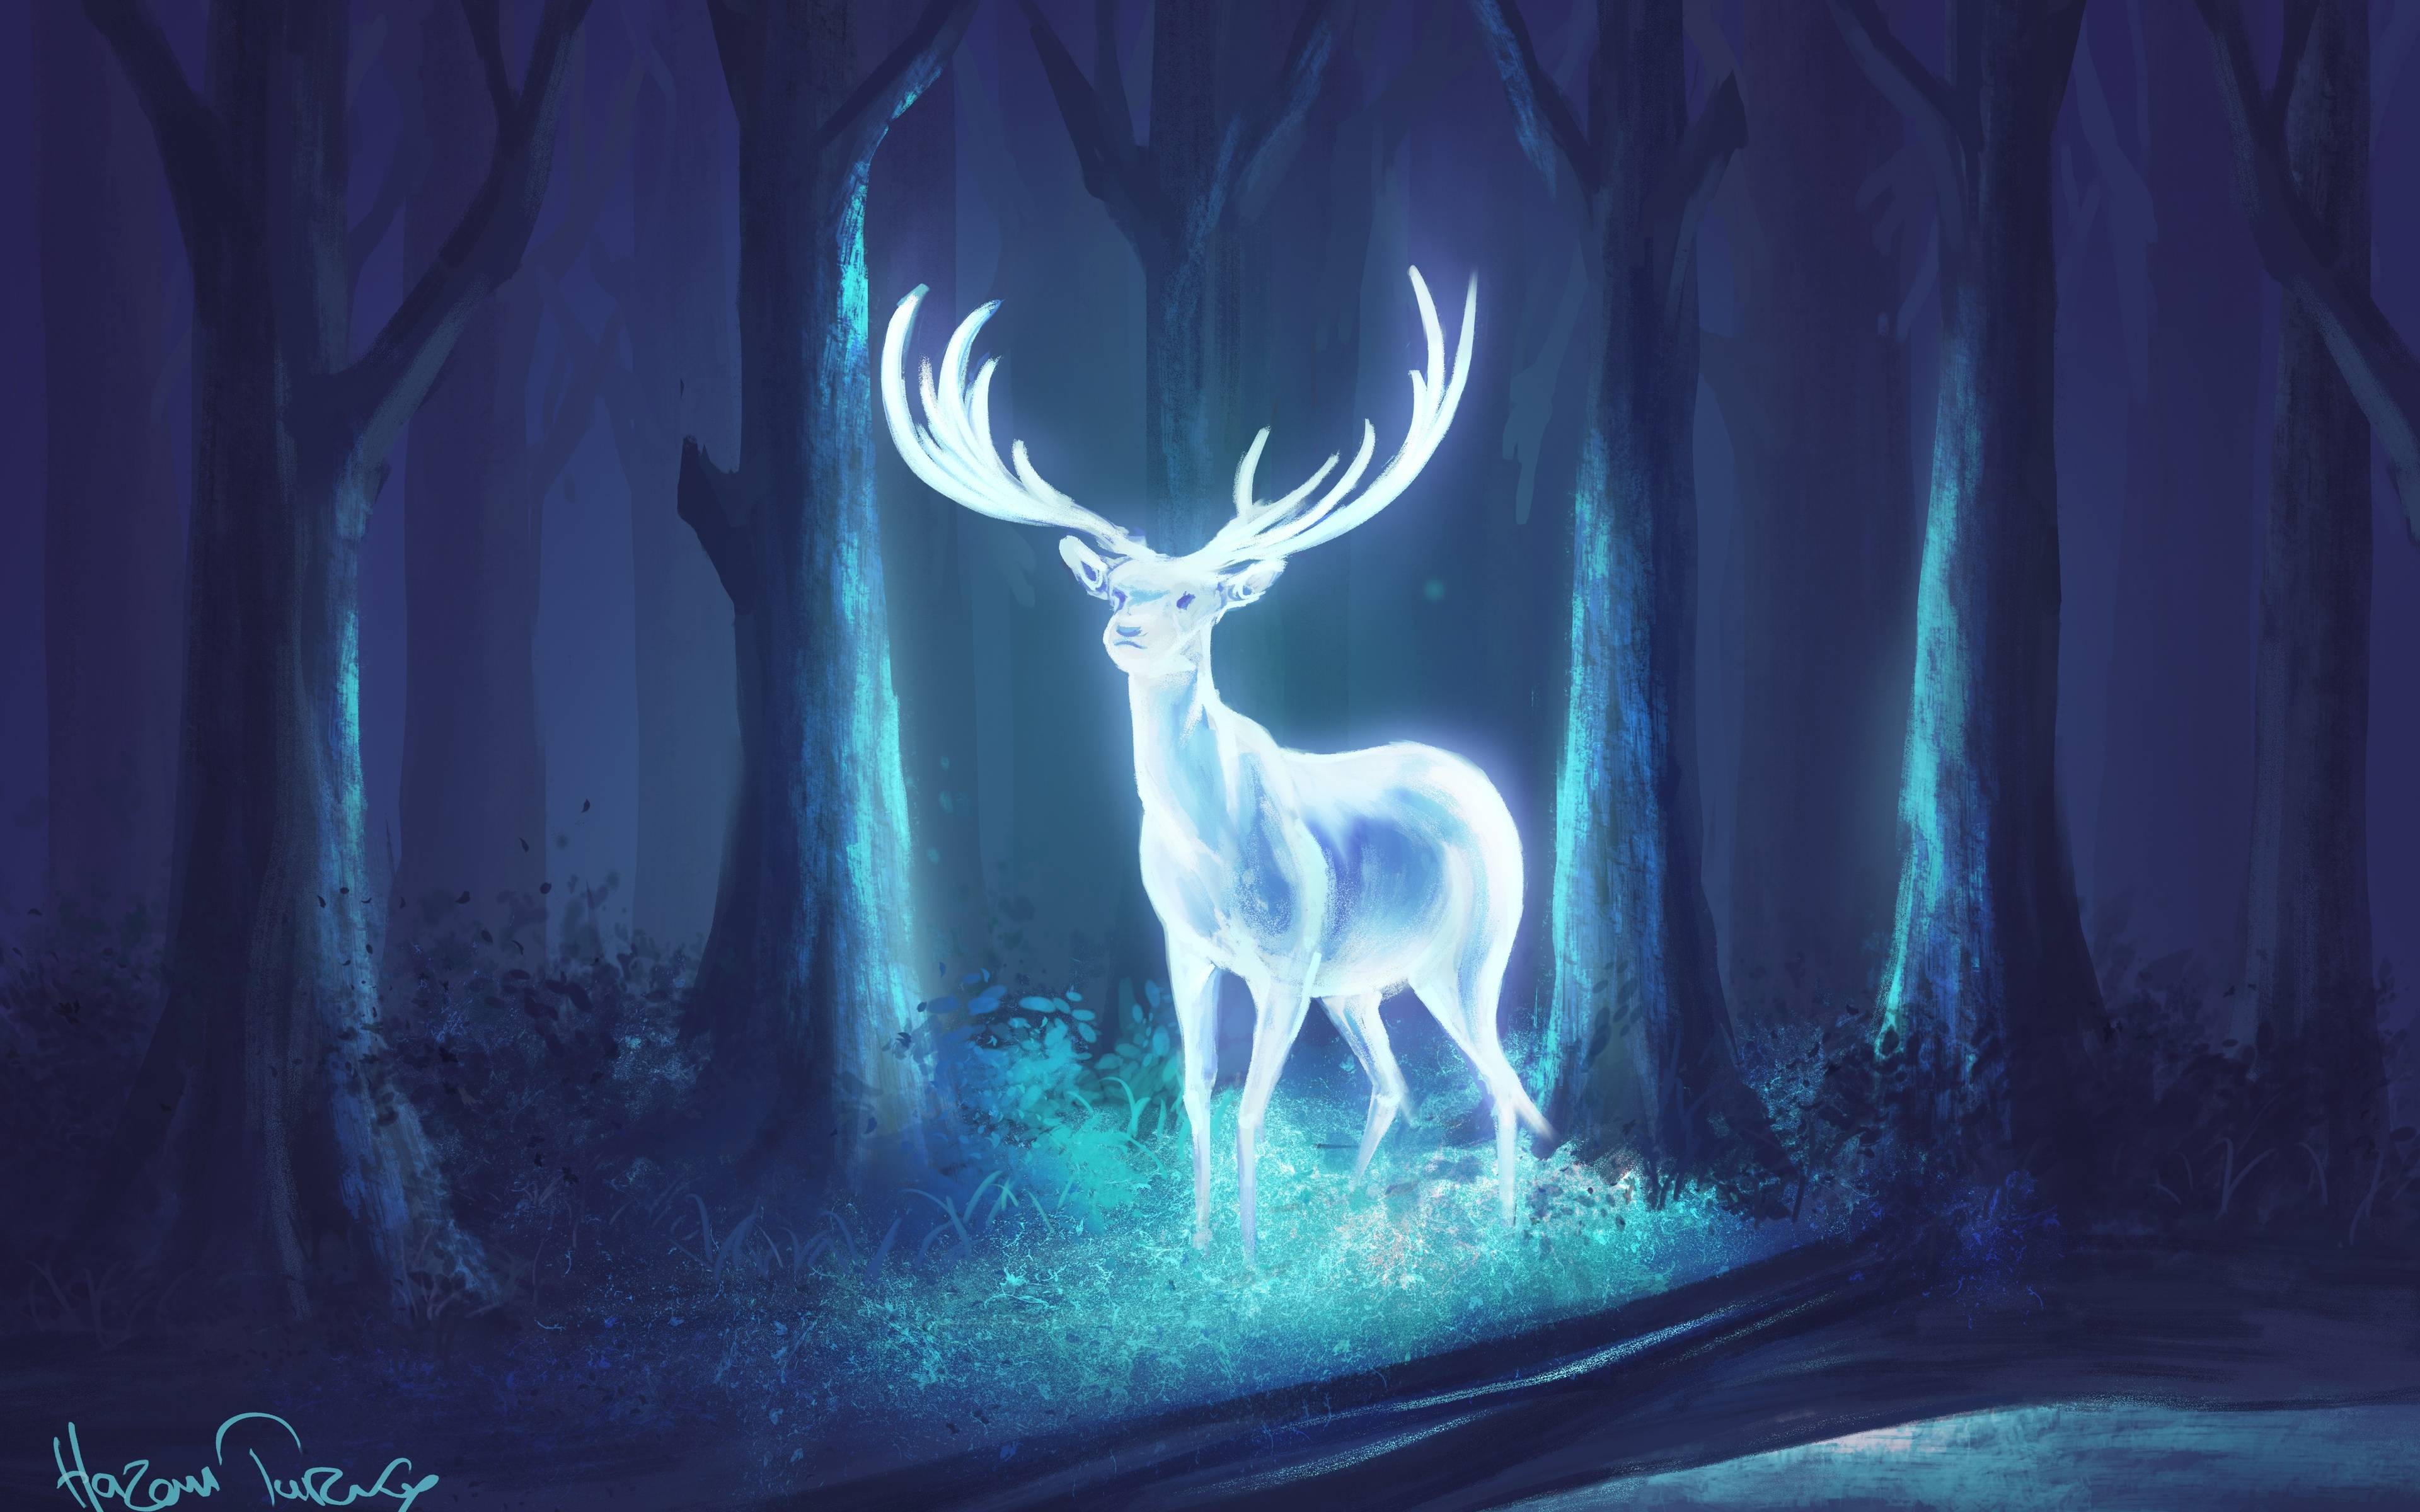 Misty Deer 4k Hd Desktop Wallpaper For 4k Ultra Hd Tv: 3840x2400 Deer Fantasy Artwork 4k HD 4k Wallpapers, Images